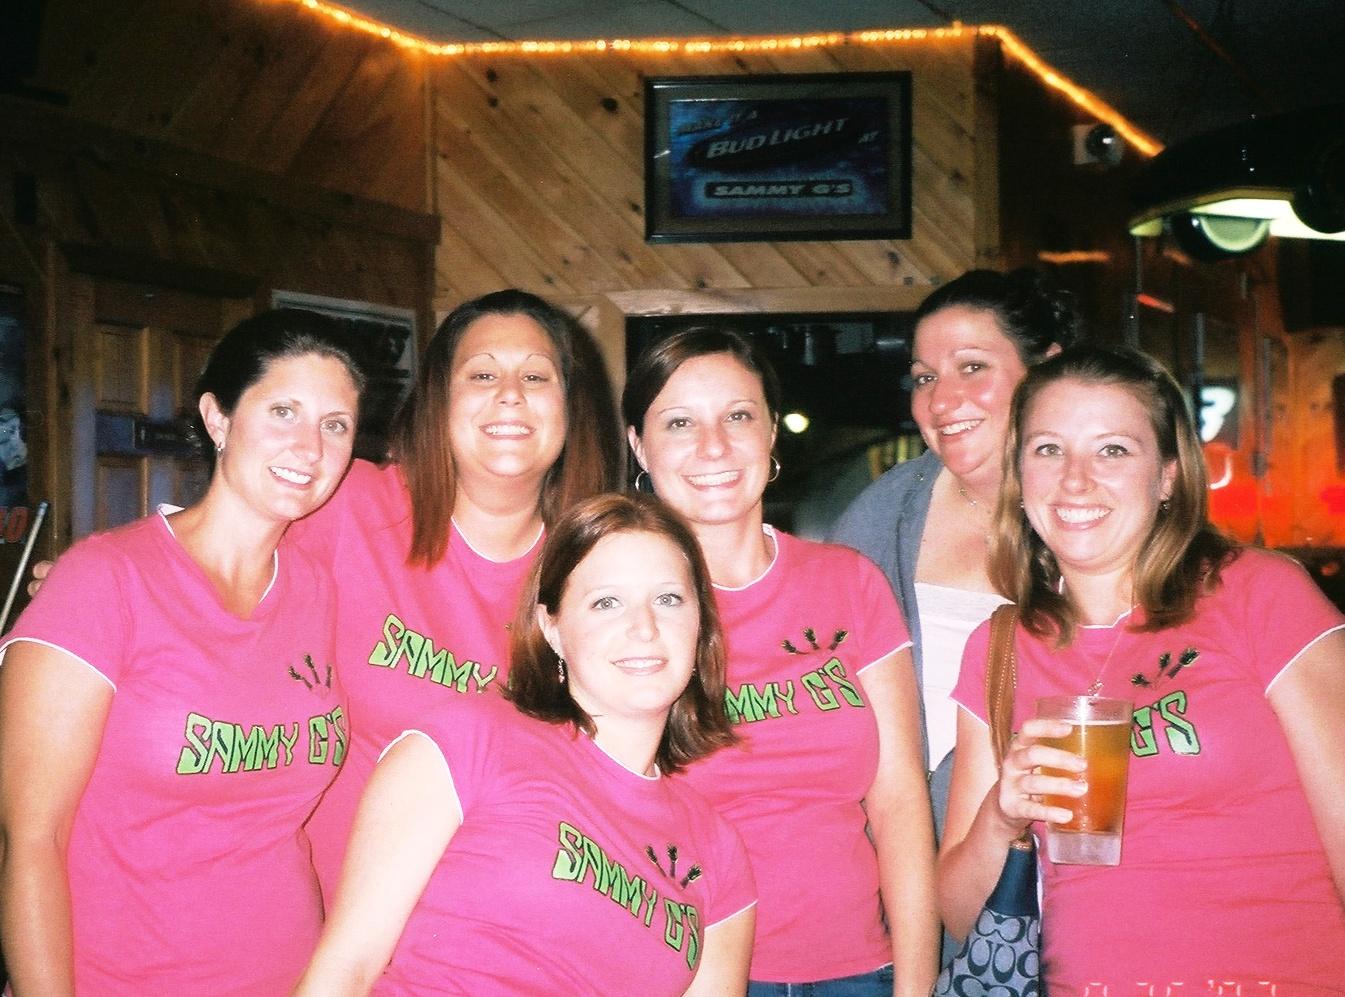 Dart shirt design your own - Sammy G Girls Darts Rny T Shirt Photo